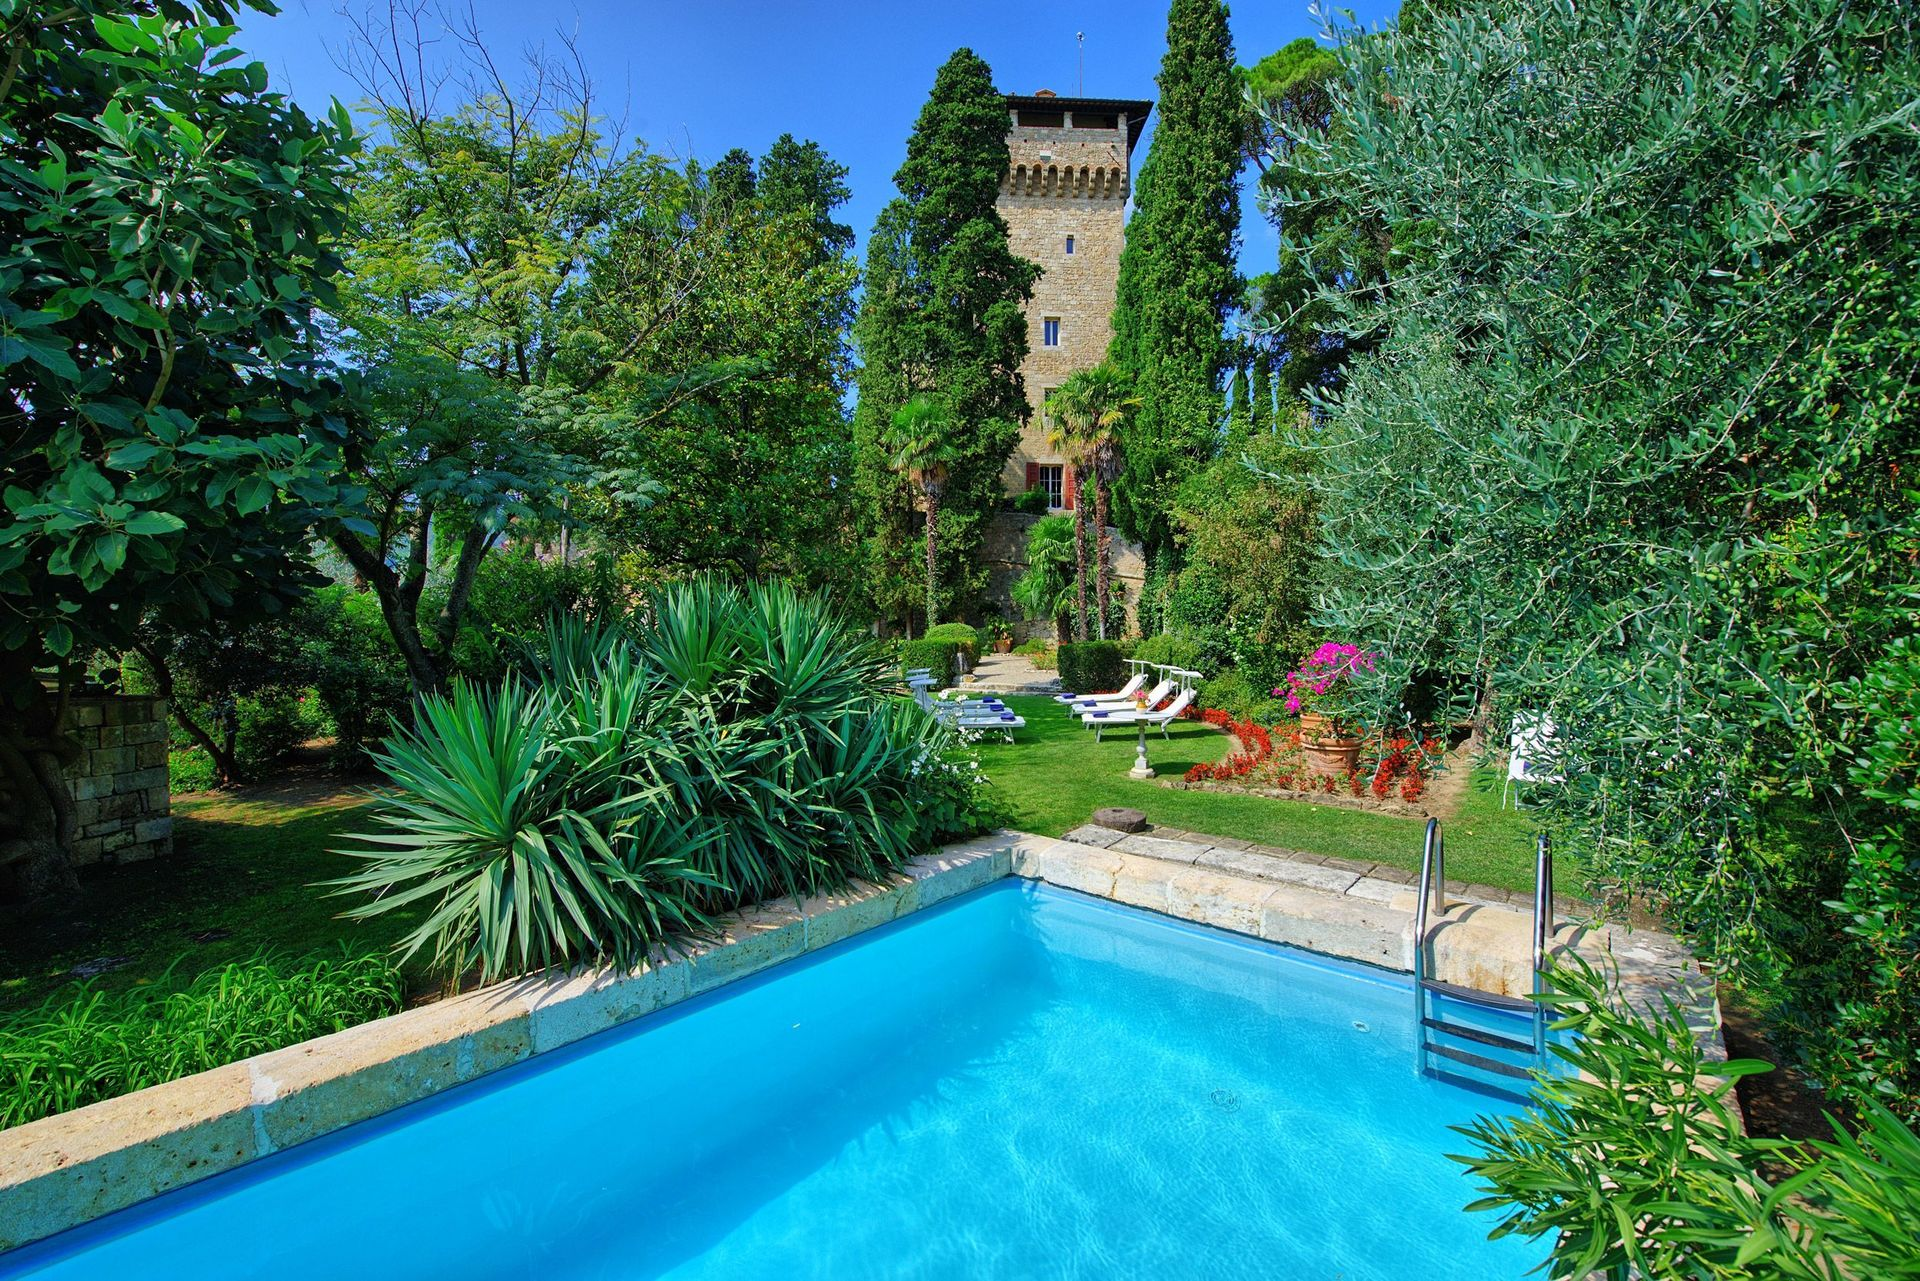 Cetona Villa Vacation Rental Rocca Di Cetona That Sleeps